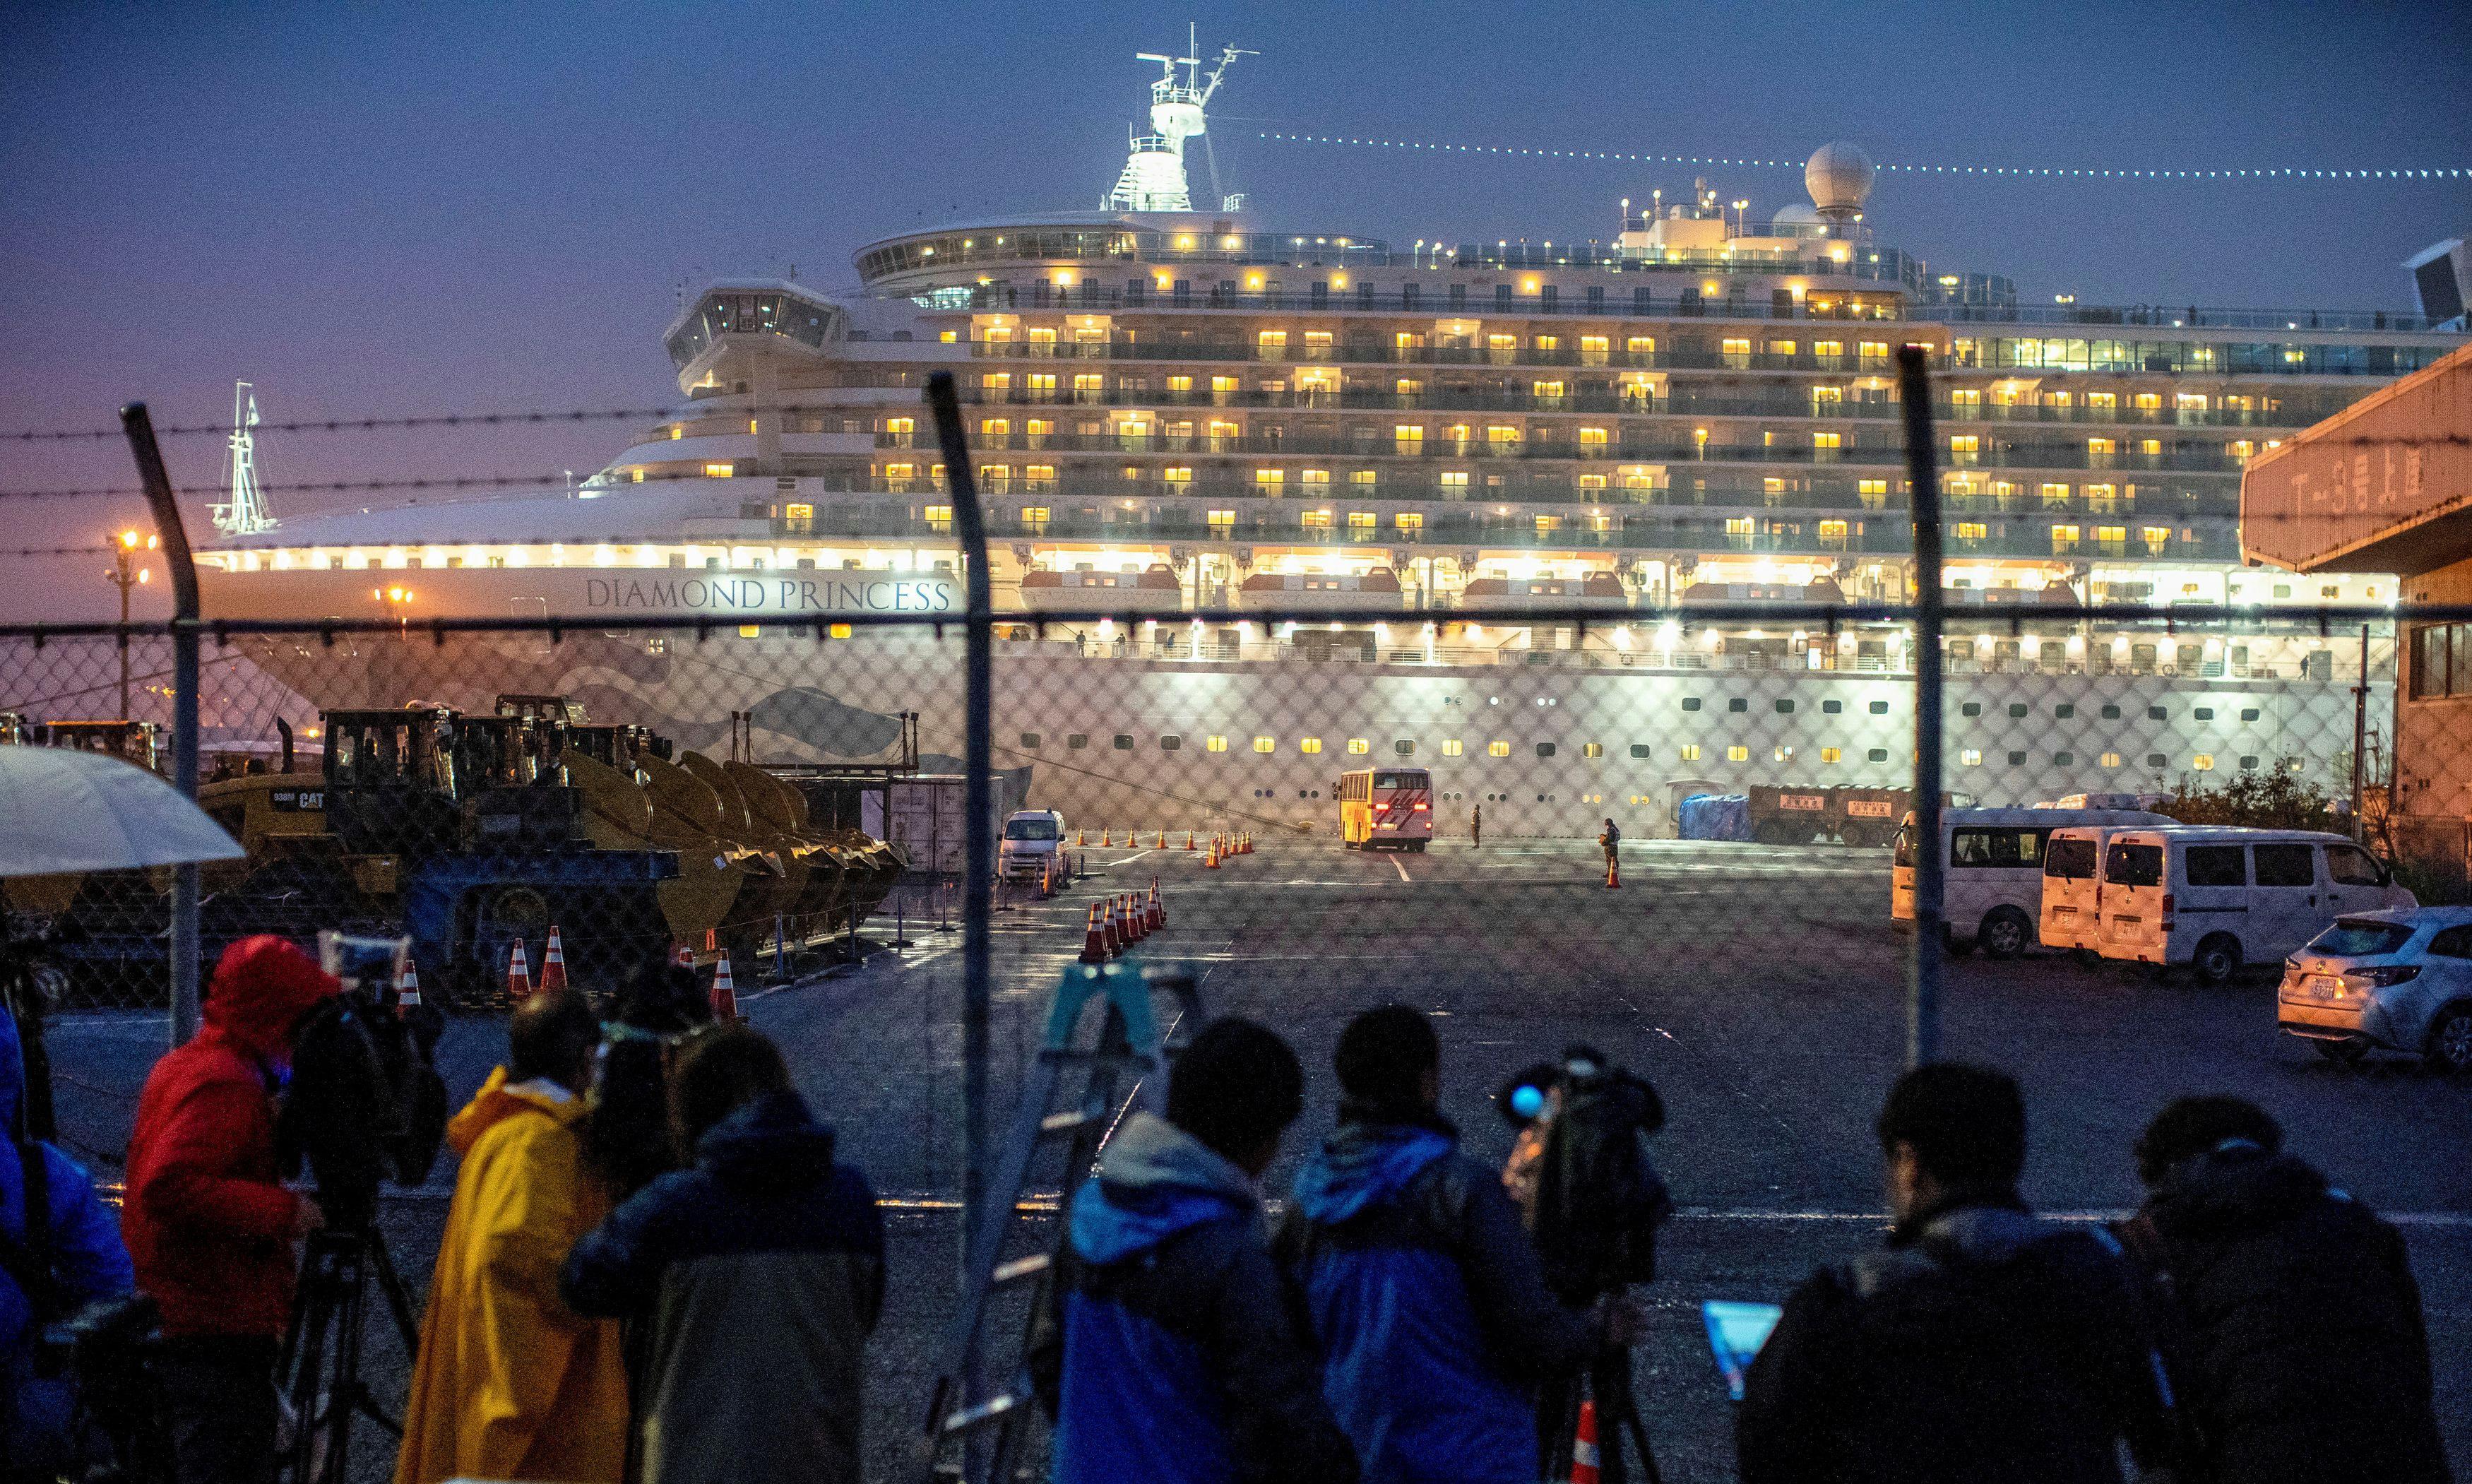 Coronavirus: Australia devising plan to evacuate citizens on board cruise ship